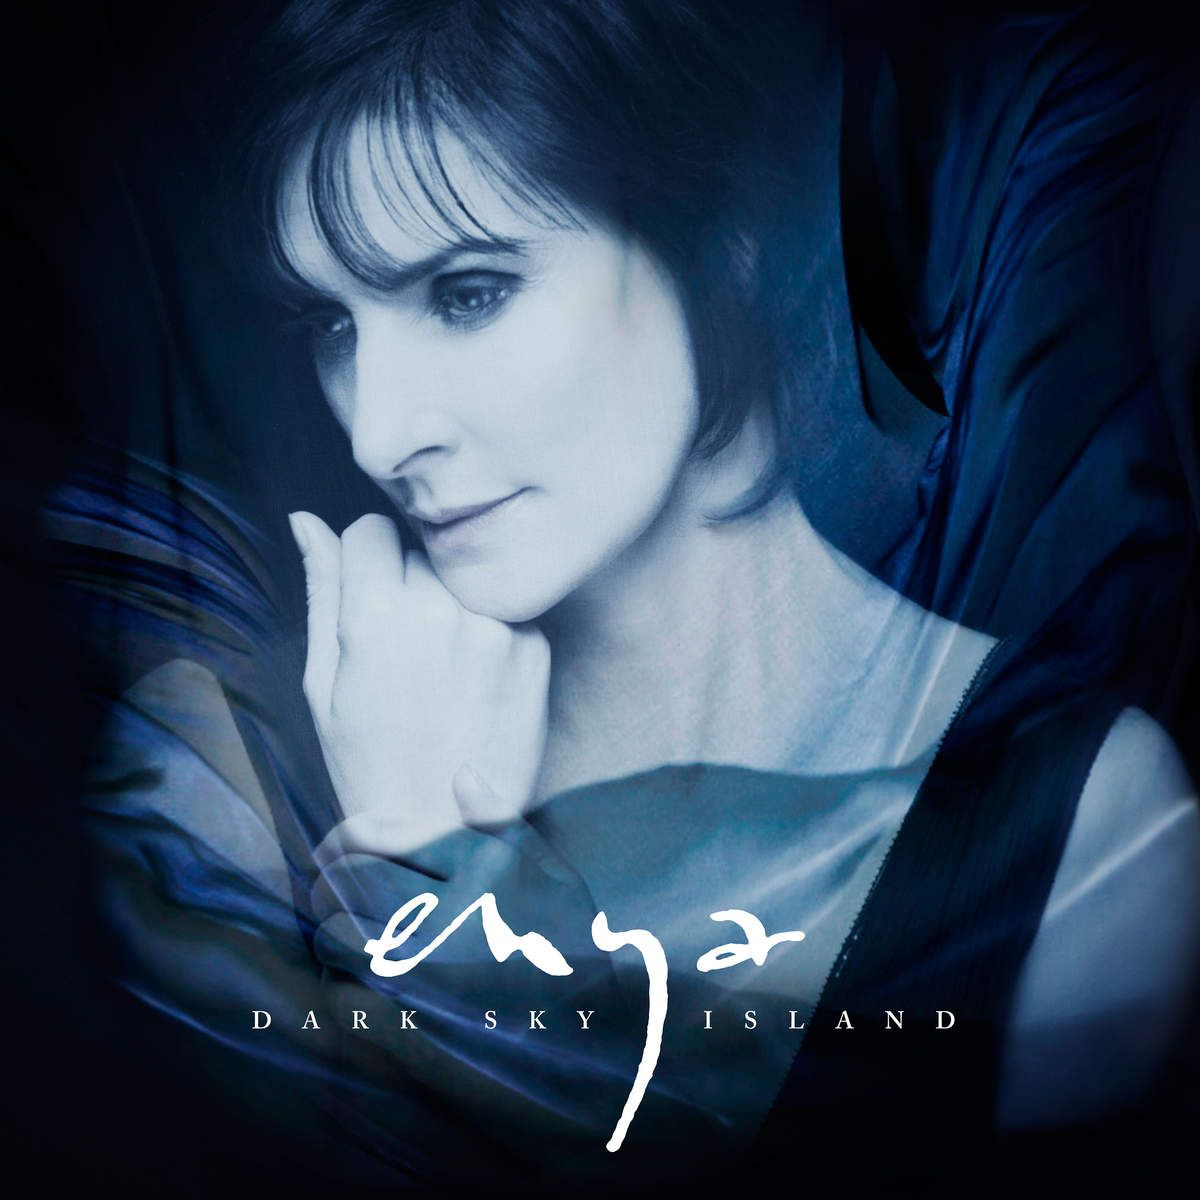 Enya - Dark Sky Island album cover